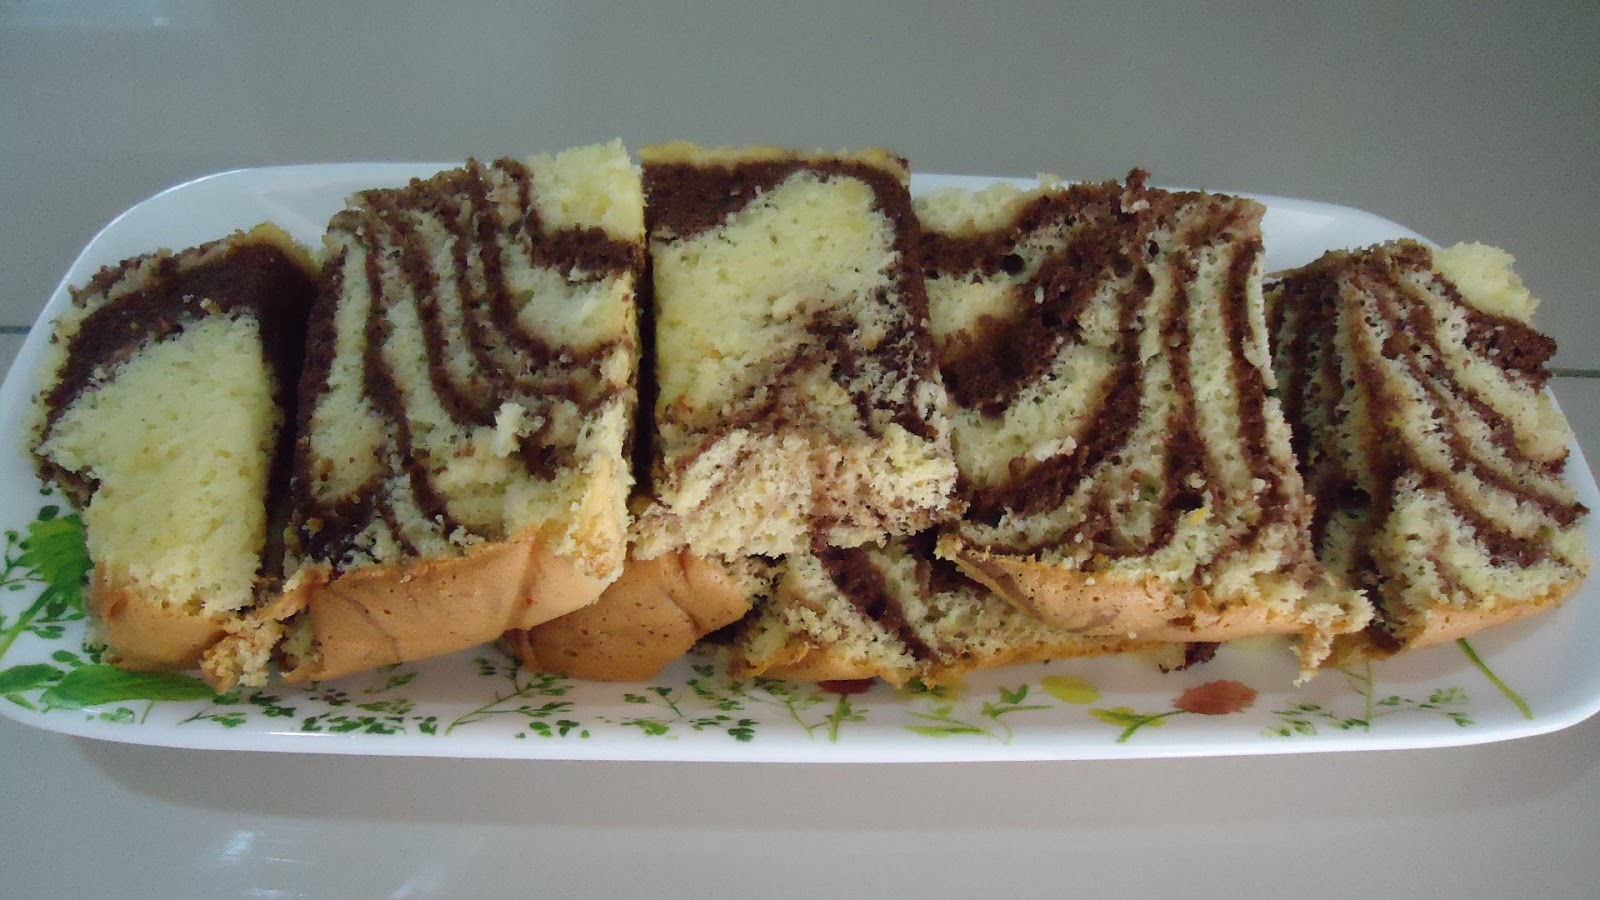 Chocolate Sponge Ingredients Of Zara Baking Orange Chocolate Sponge Cake